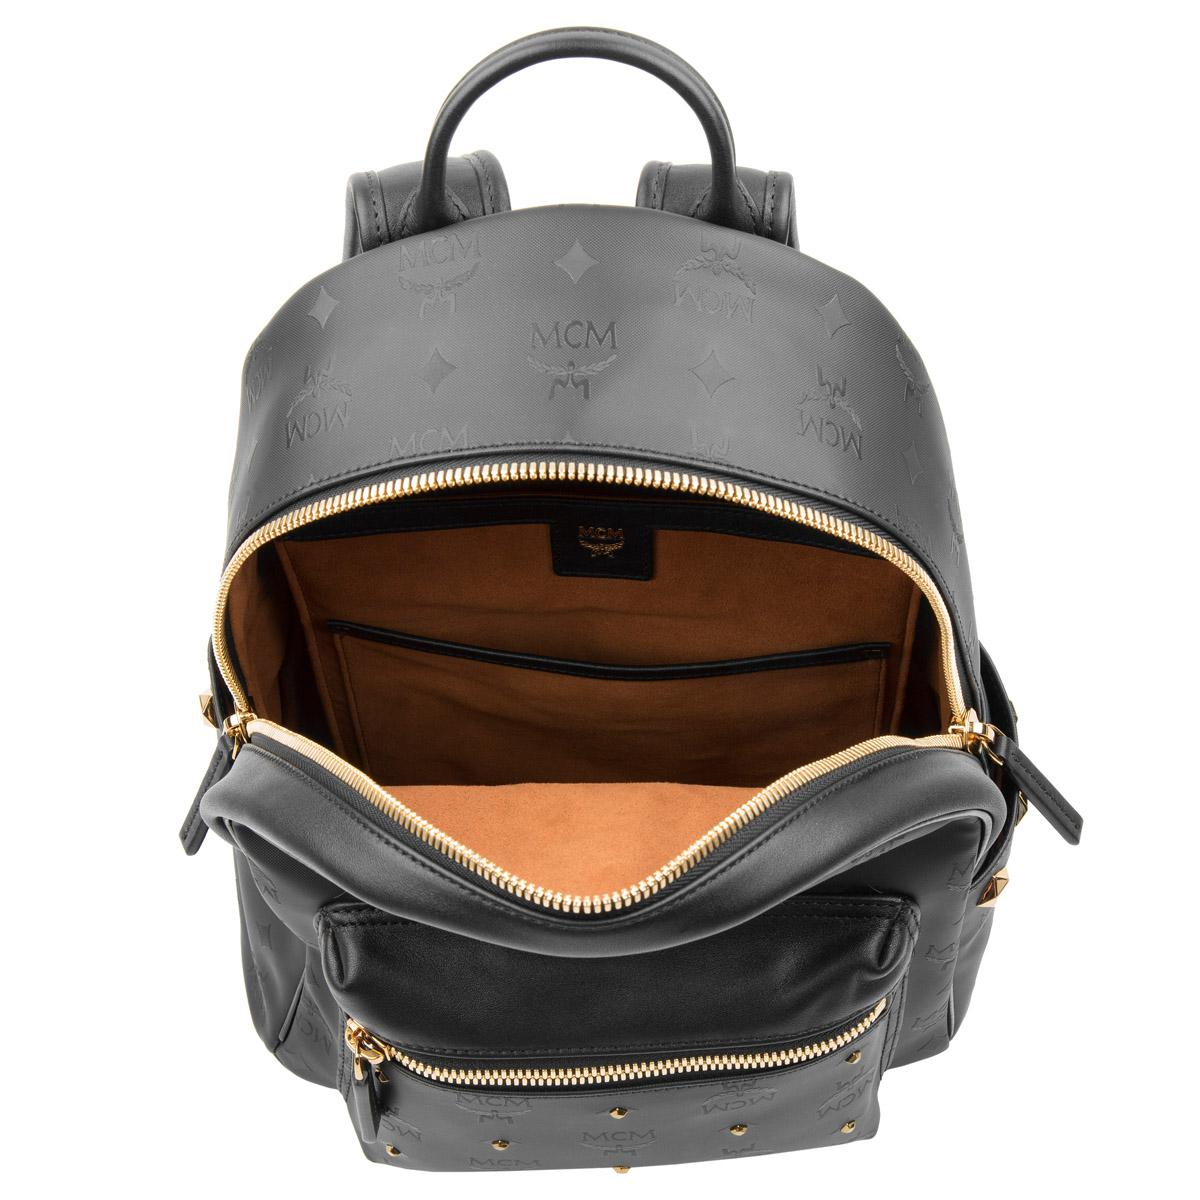 7bd7dd6ed0f1a MCM Stark Odeon Backpack Small Black in Black - Lyst